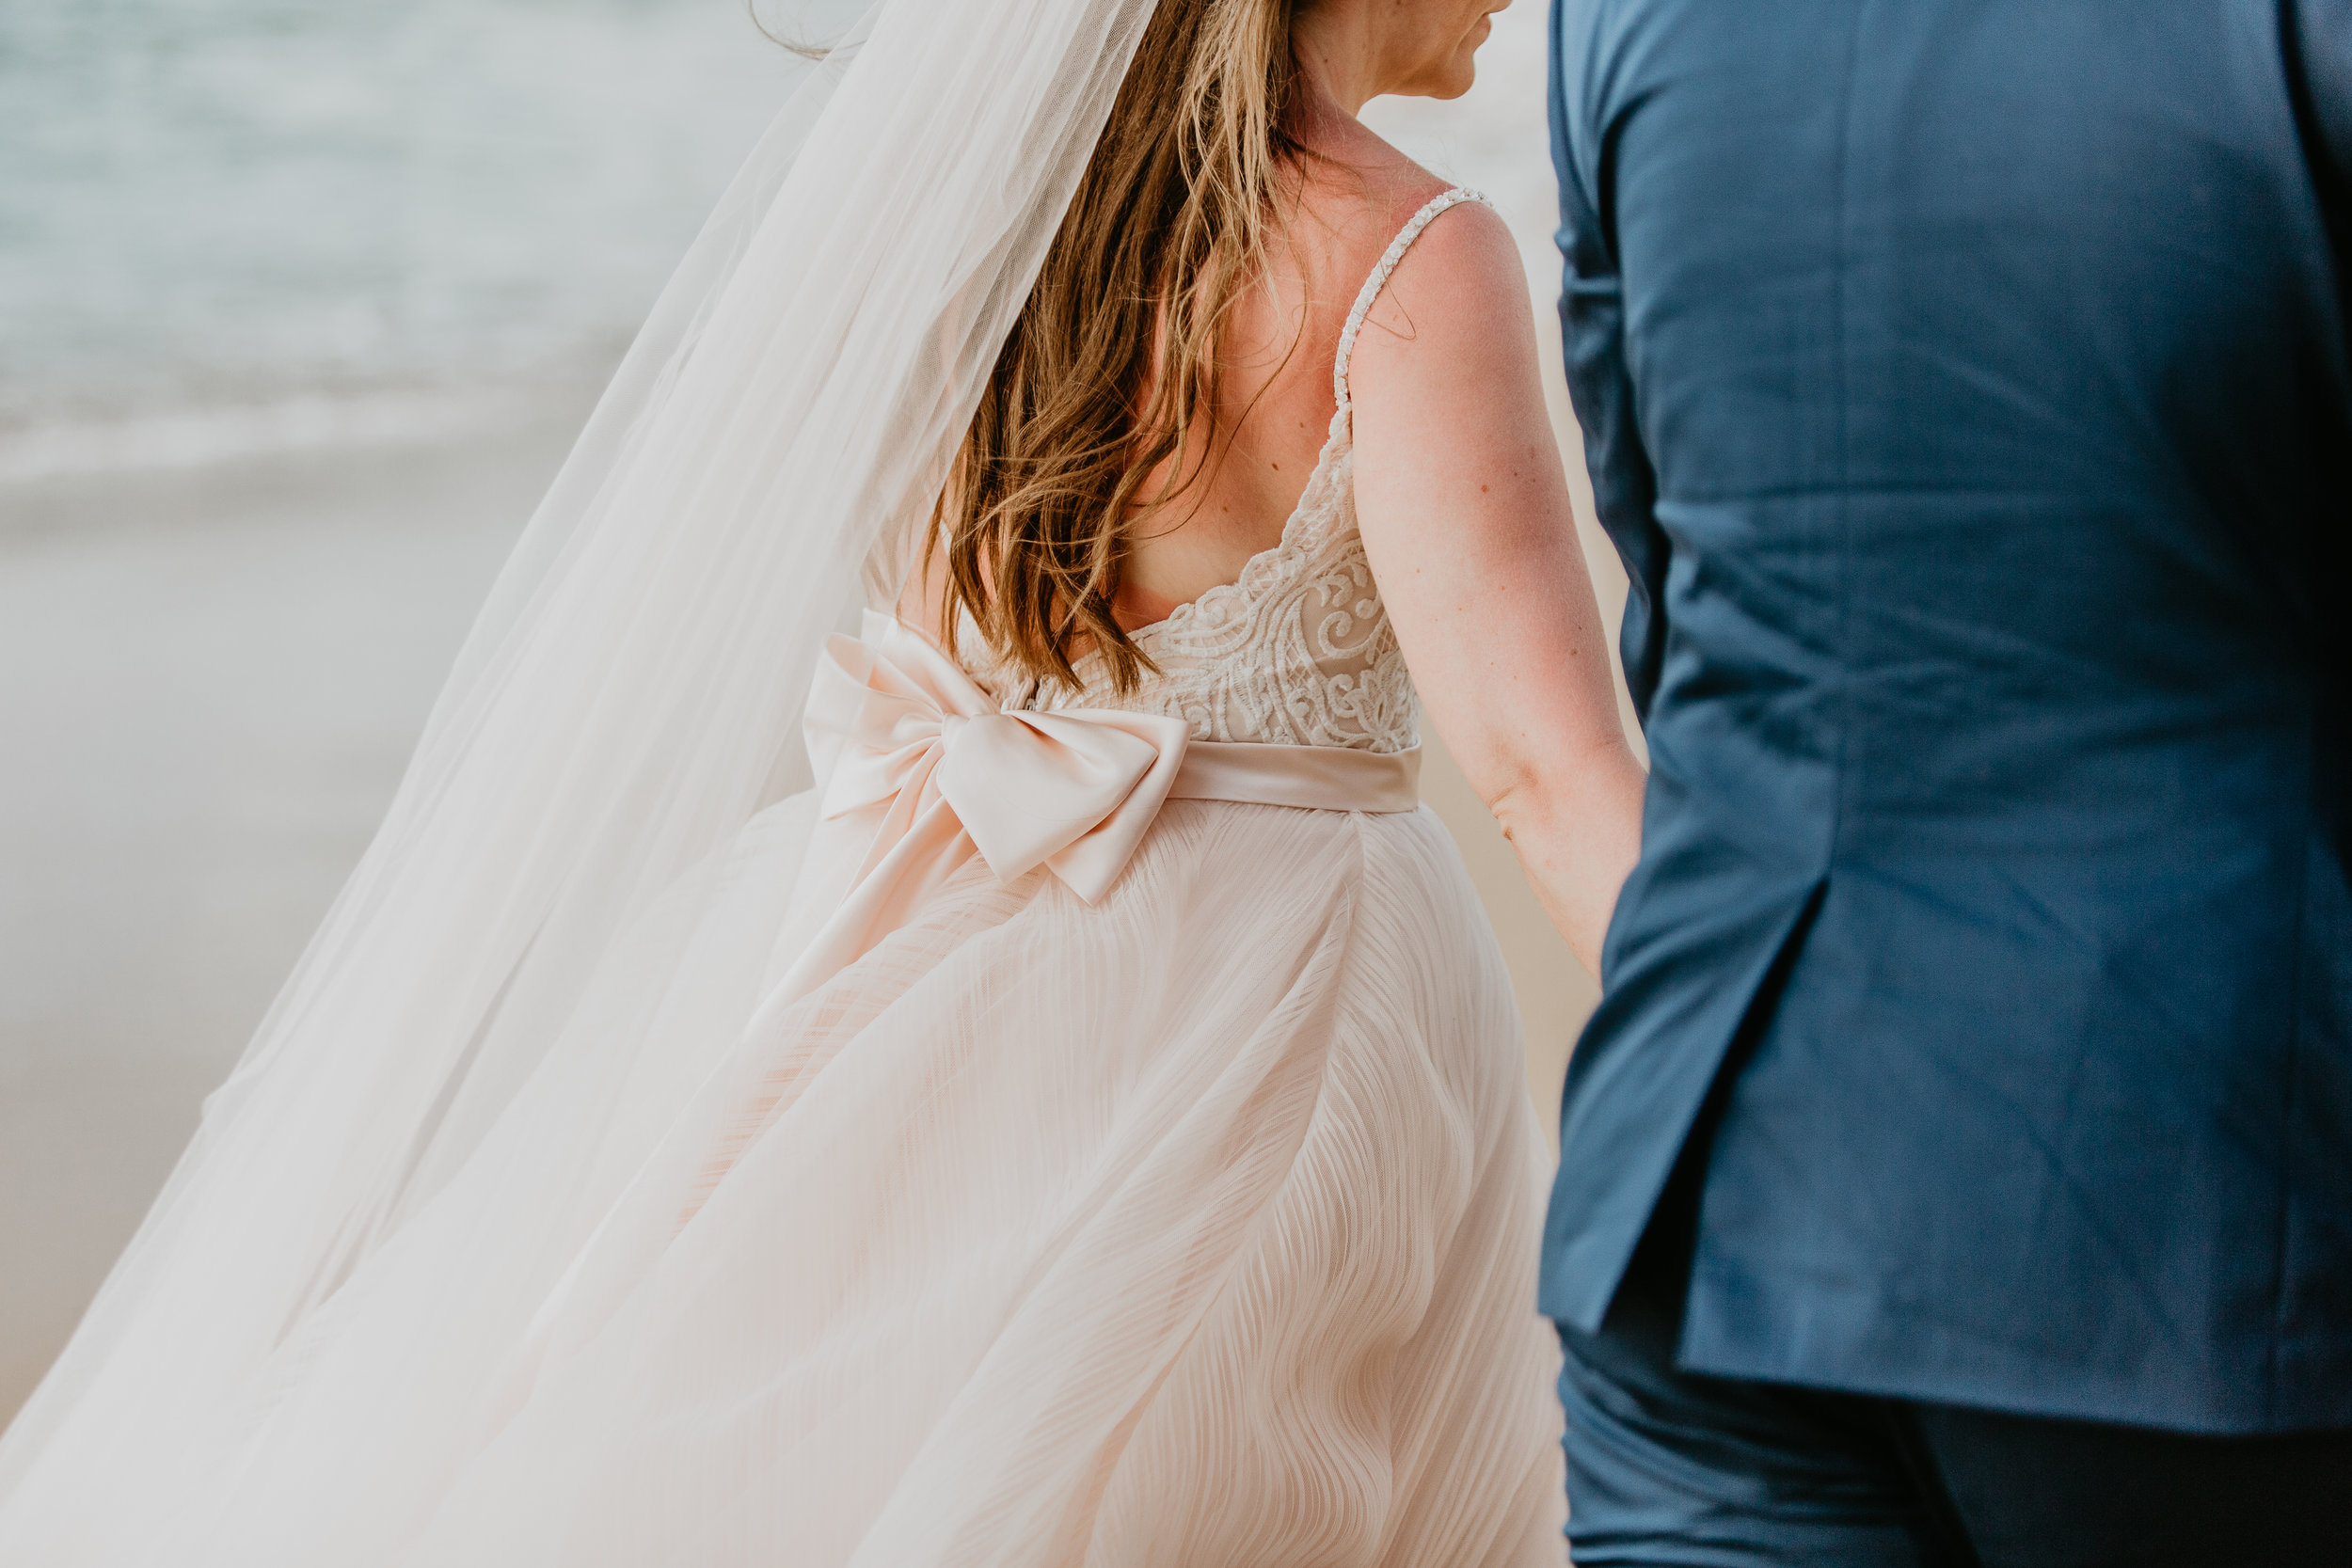 nicole-daacke-photography-destination-wedding-in-st-lucia-sandals-la-toc-intimate-island-wedding-carribean-elopement-photographer-chill-island-wedding-86.jpg